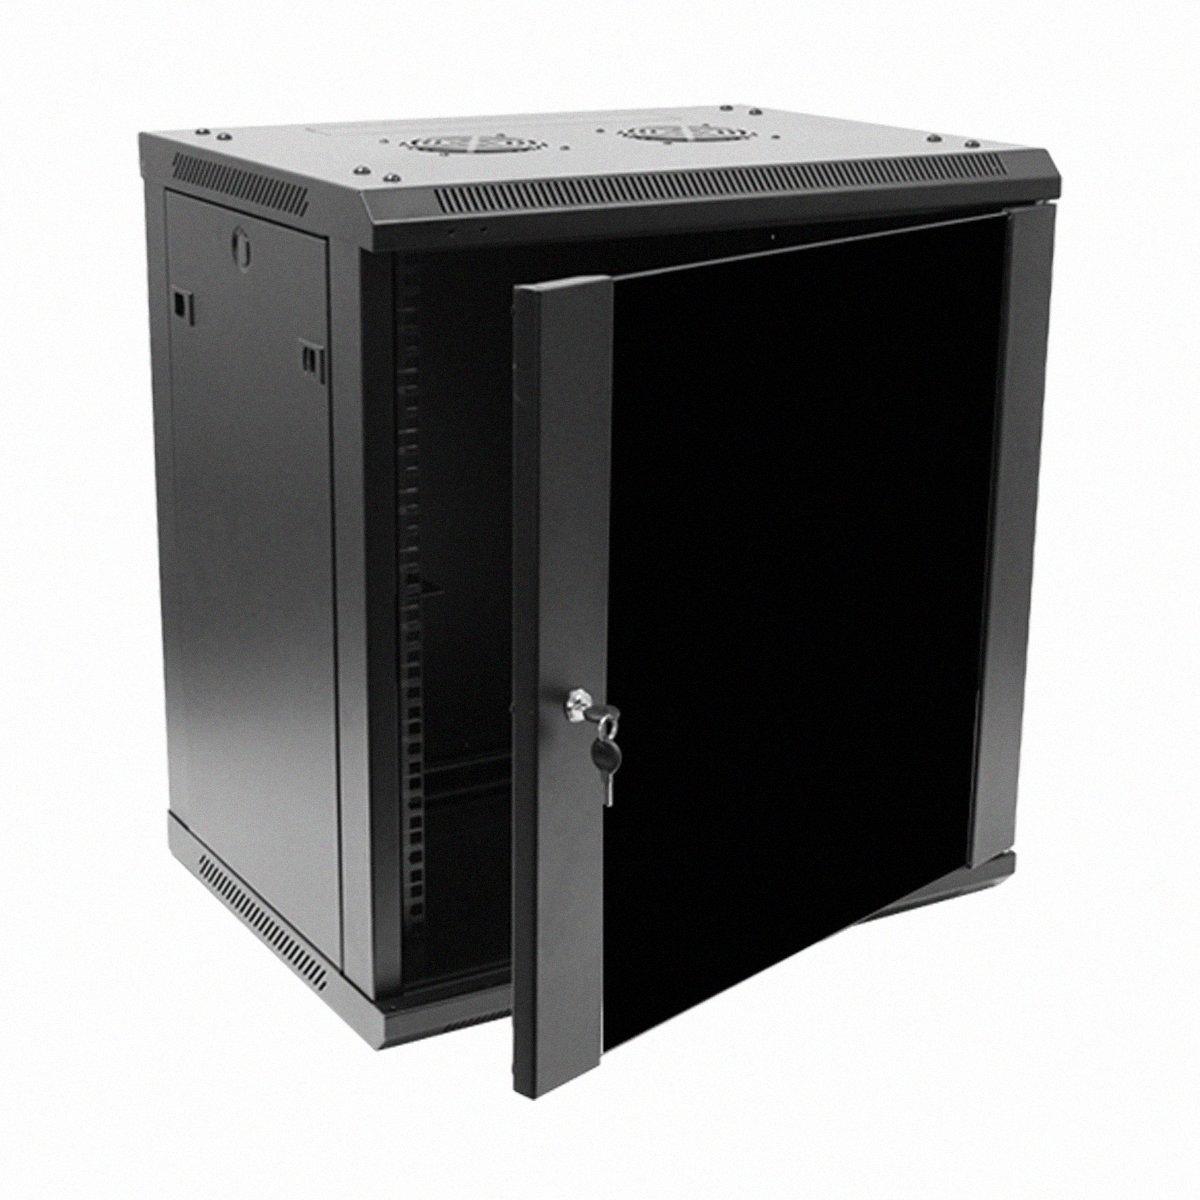 Amazon.com: Navepoint 12U Deluxe IT Wallmount Cabinet Enclosure 19 Inch  Server Network Rack With Locking Glass Door 16 Inches Deep Black:  Electronics